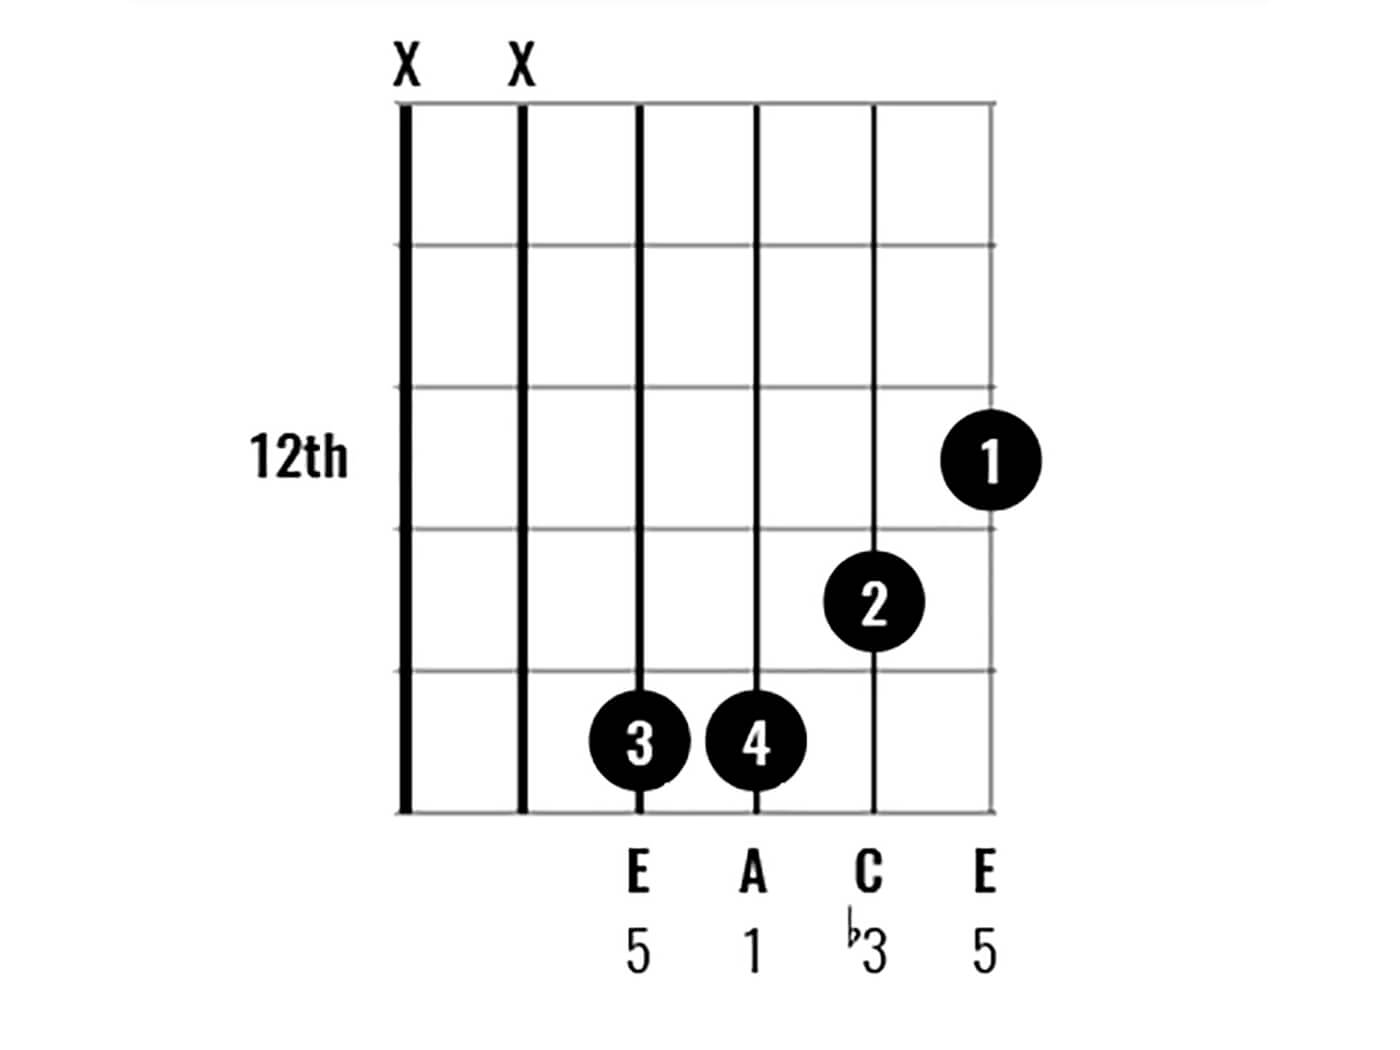 Chord Clinic A Minor over E